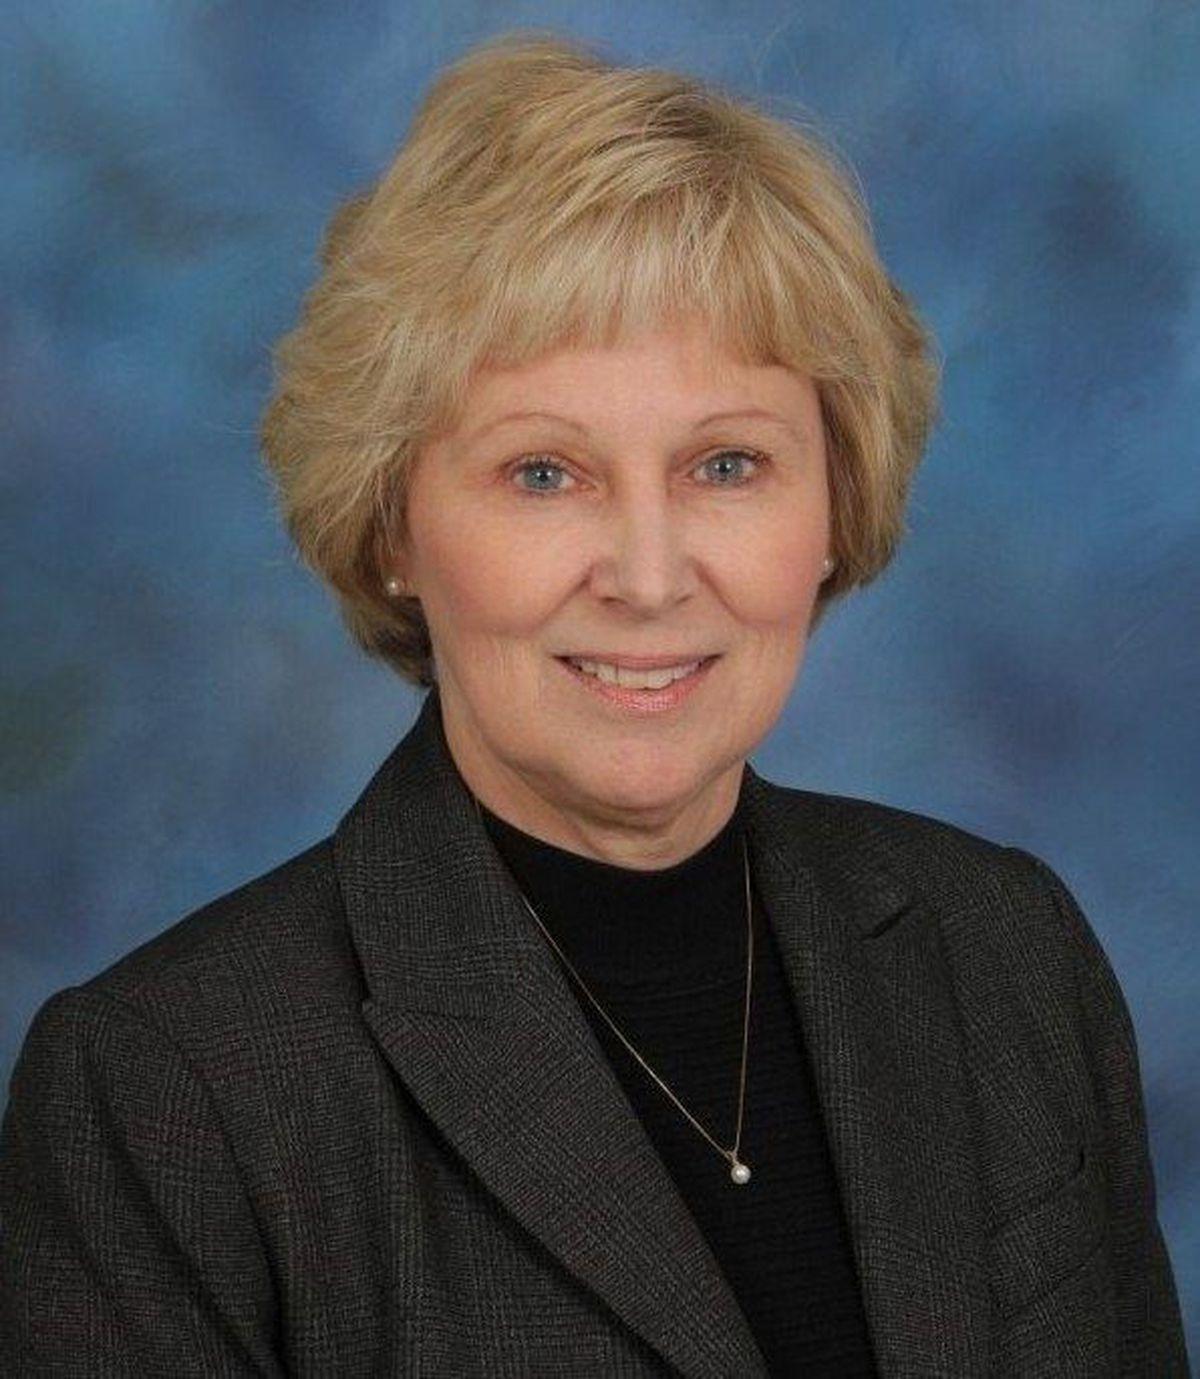 Pender County Schools Superintendent To Retire